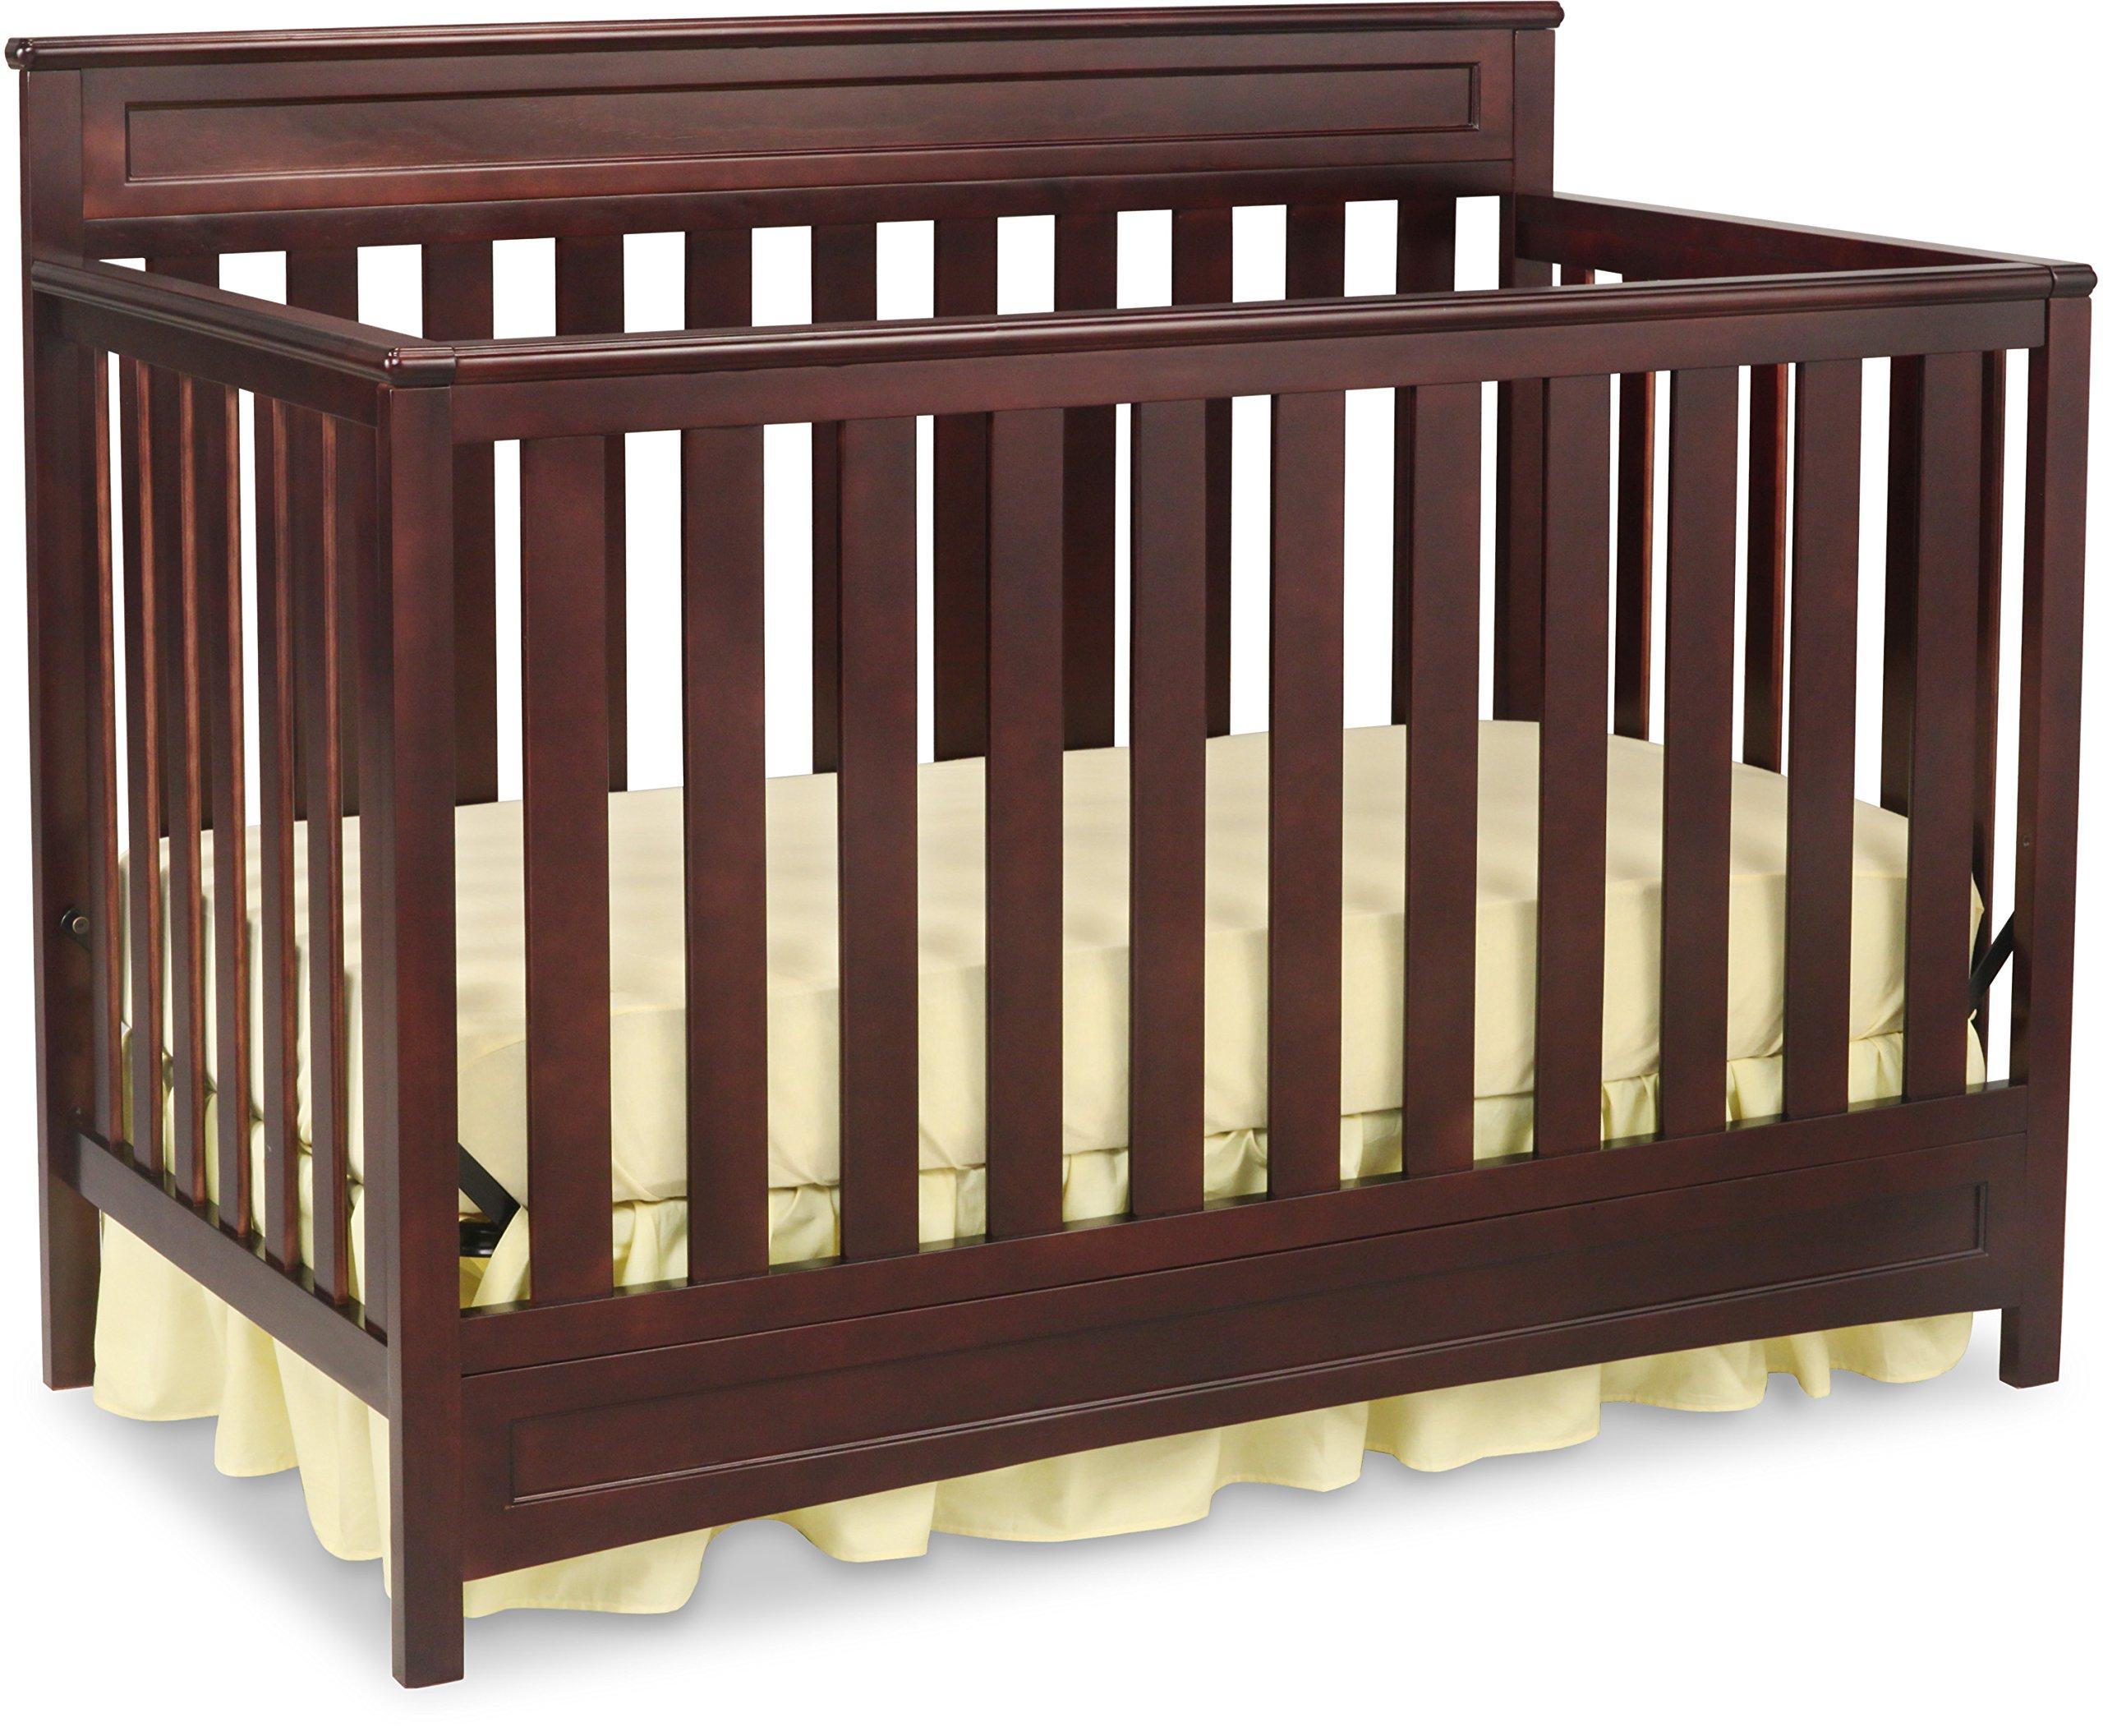 Delta Children Geneva 4-in-1 Convertible Crib, Dark Chocolate